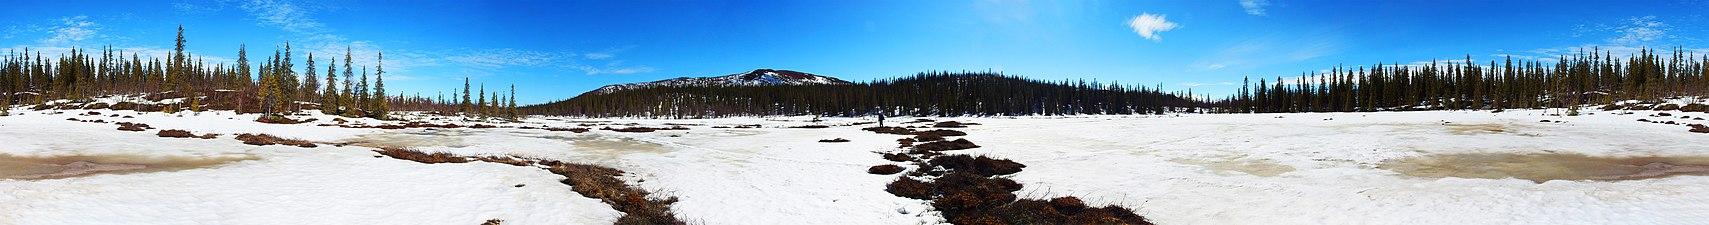 Sarek National Park 2017 Sweden.jpg